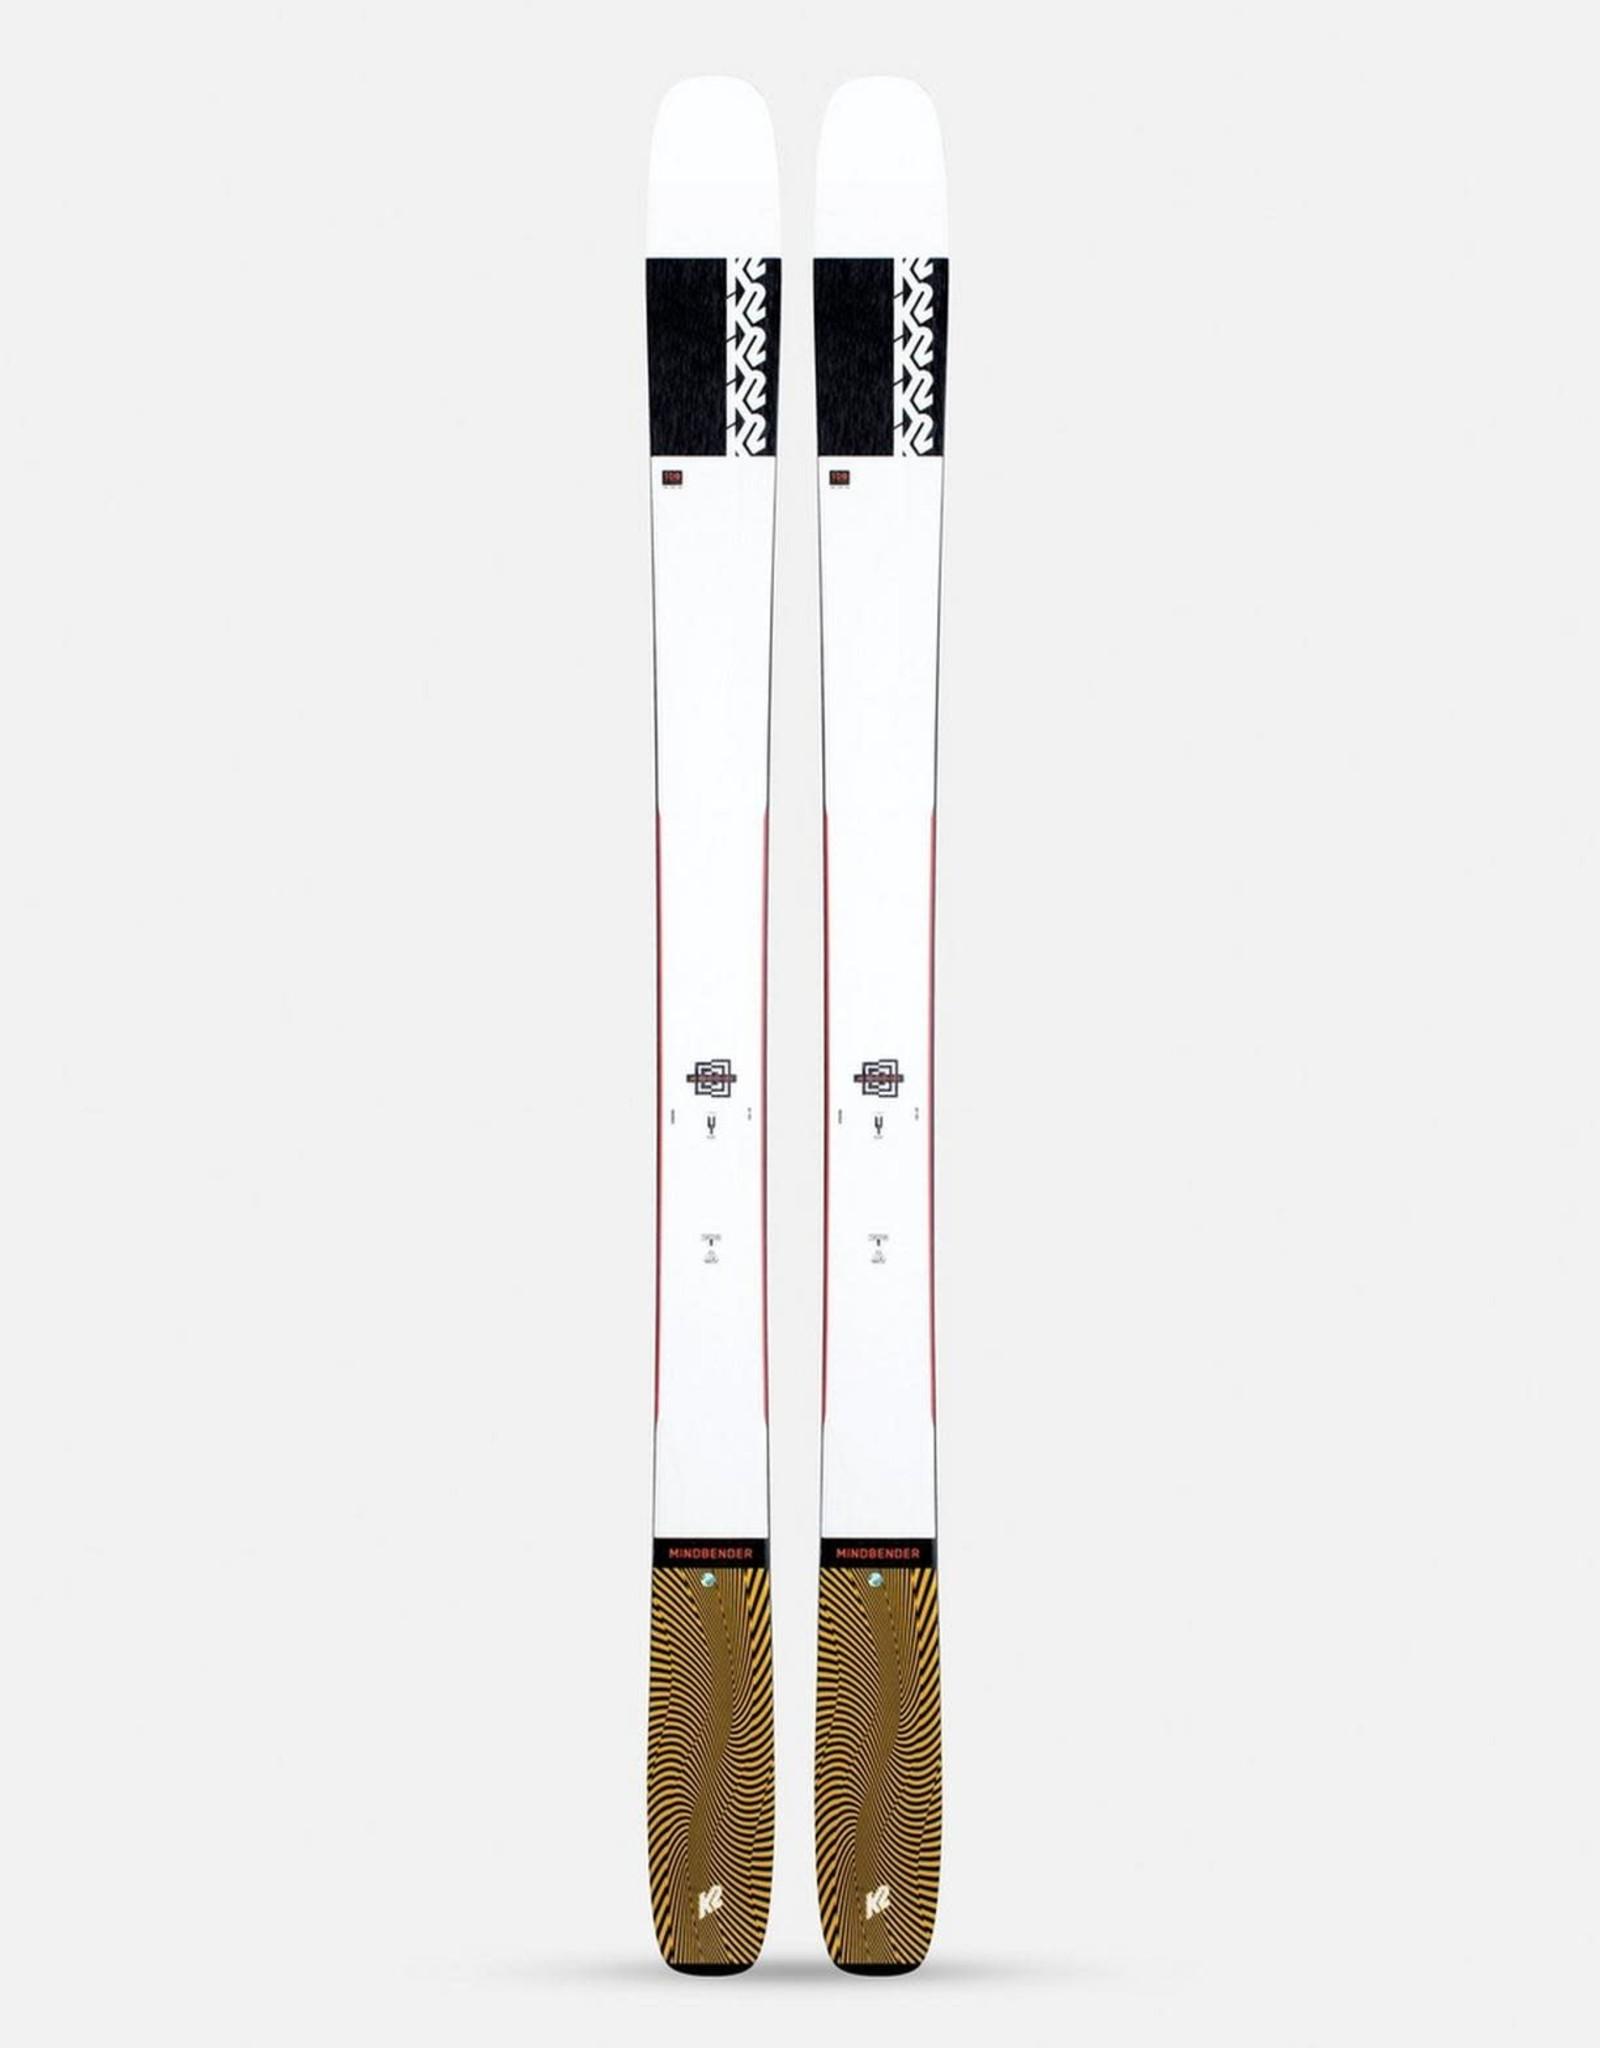 K2 - MINDBENDER 108Ti (2021) - 186cm